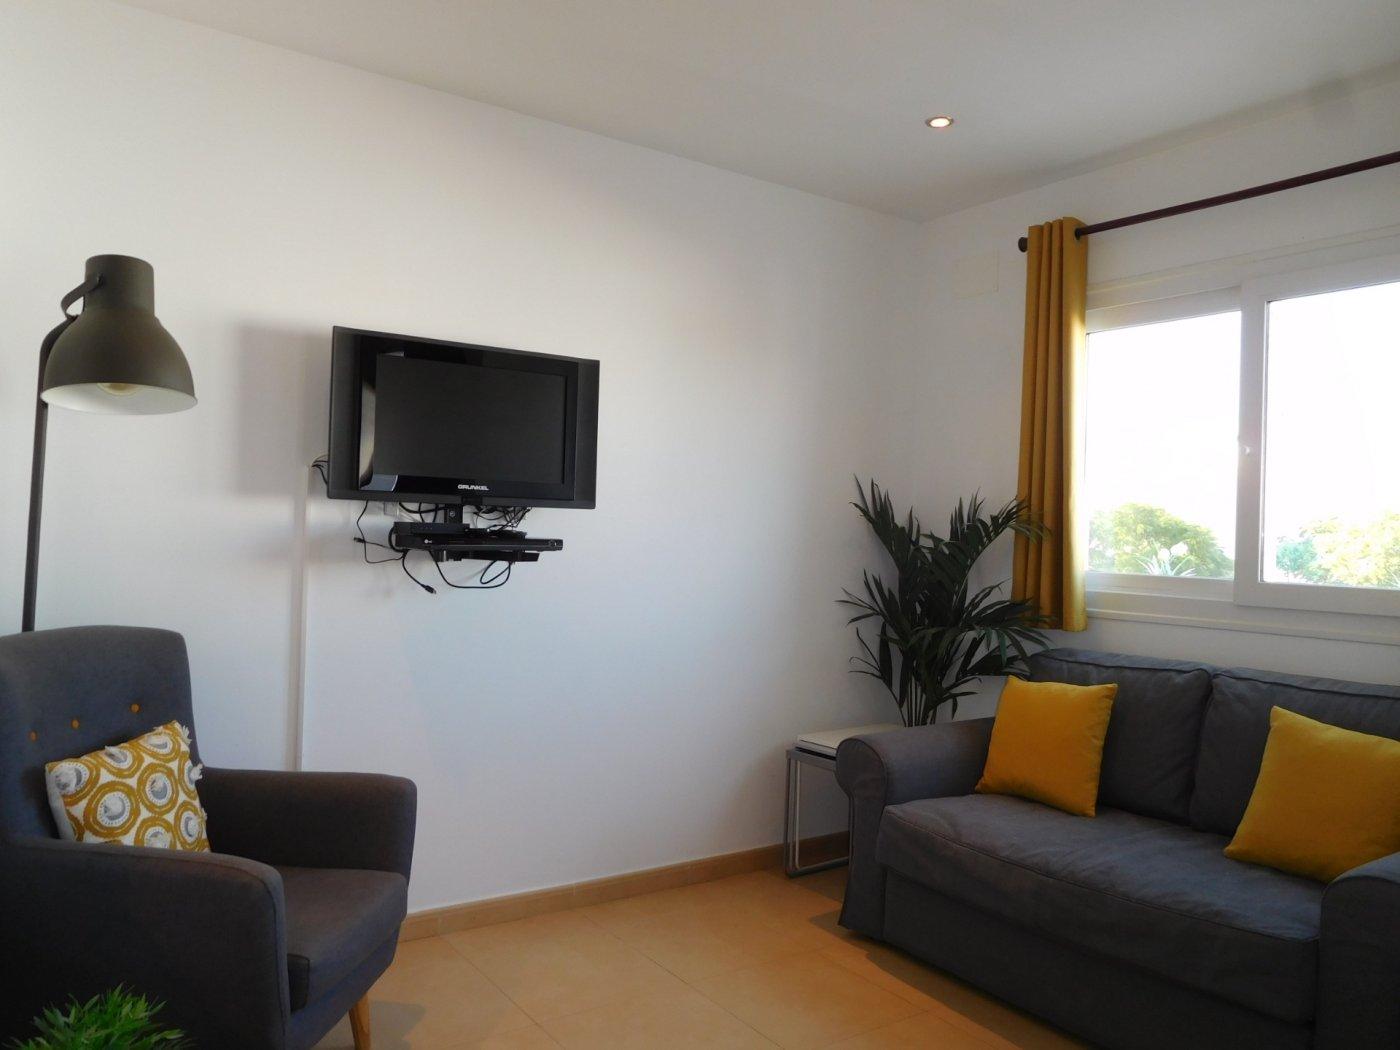 Gallery Image 5 of Apartment For rent in Condado De Alhama, Alhama De Murcia With Pool